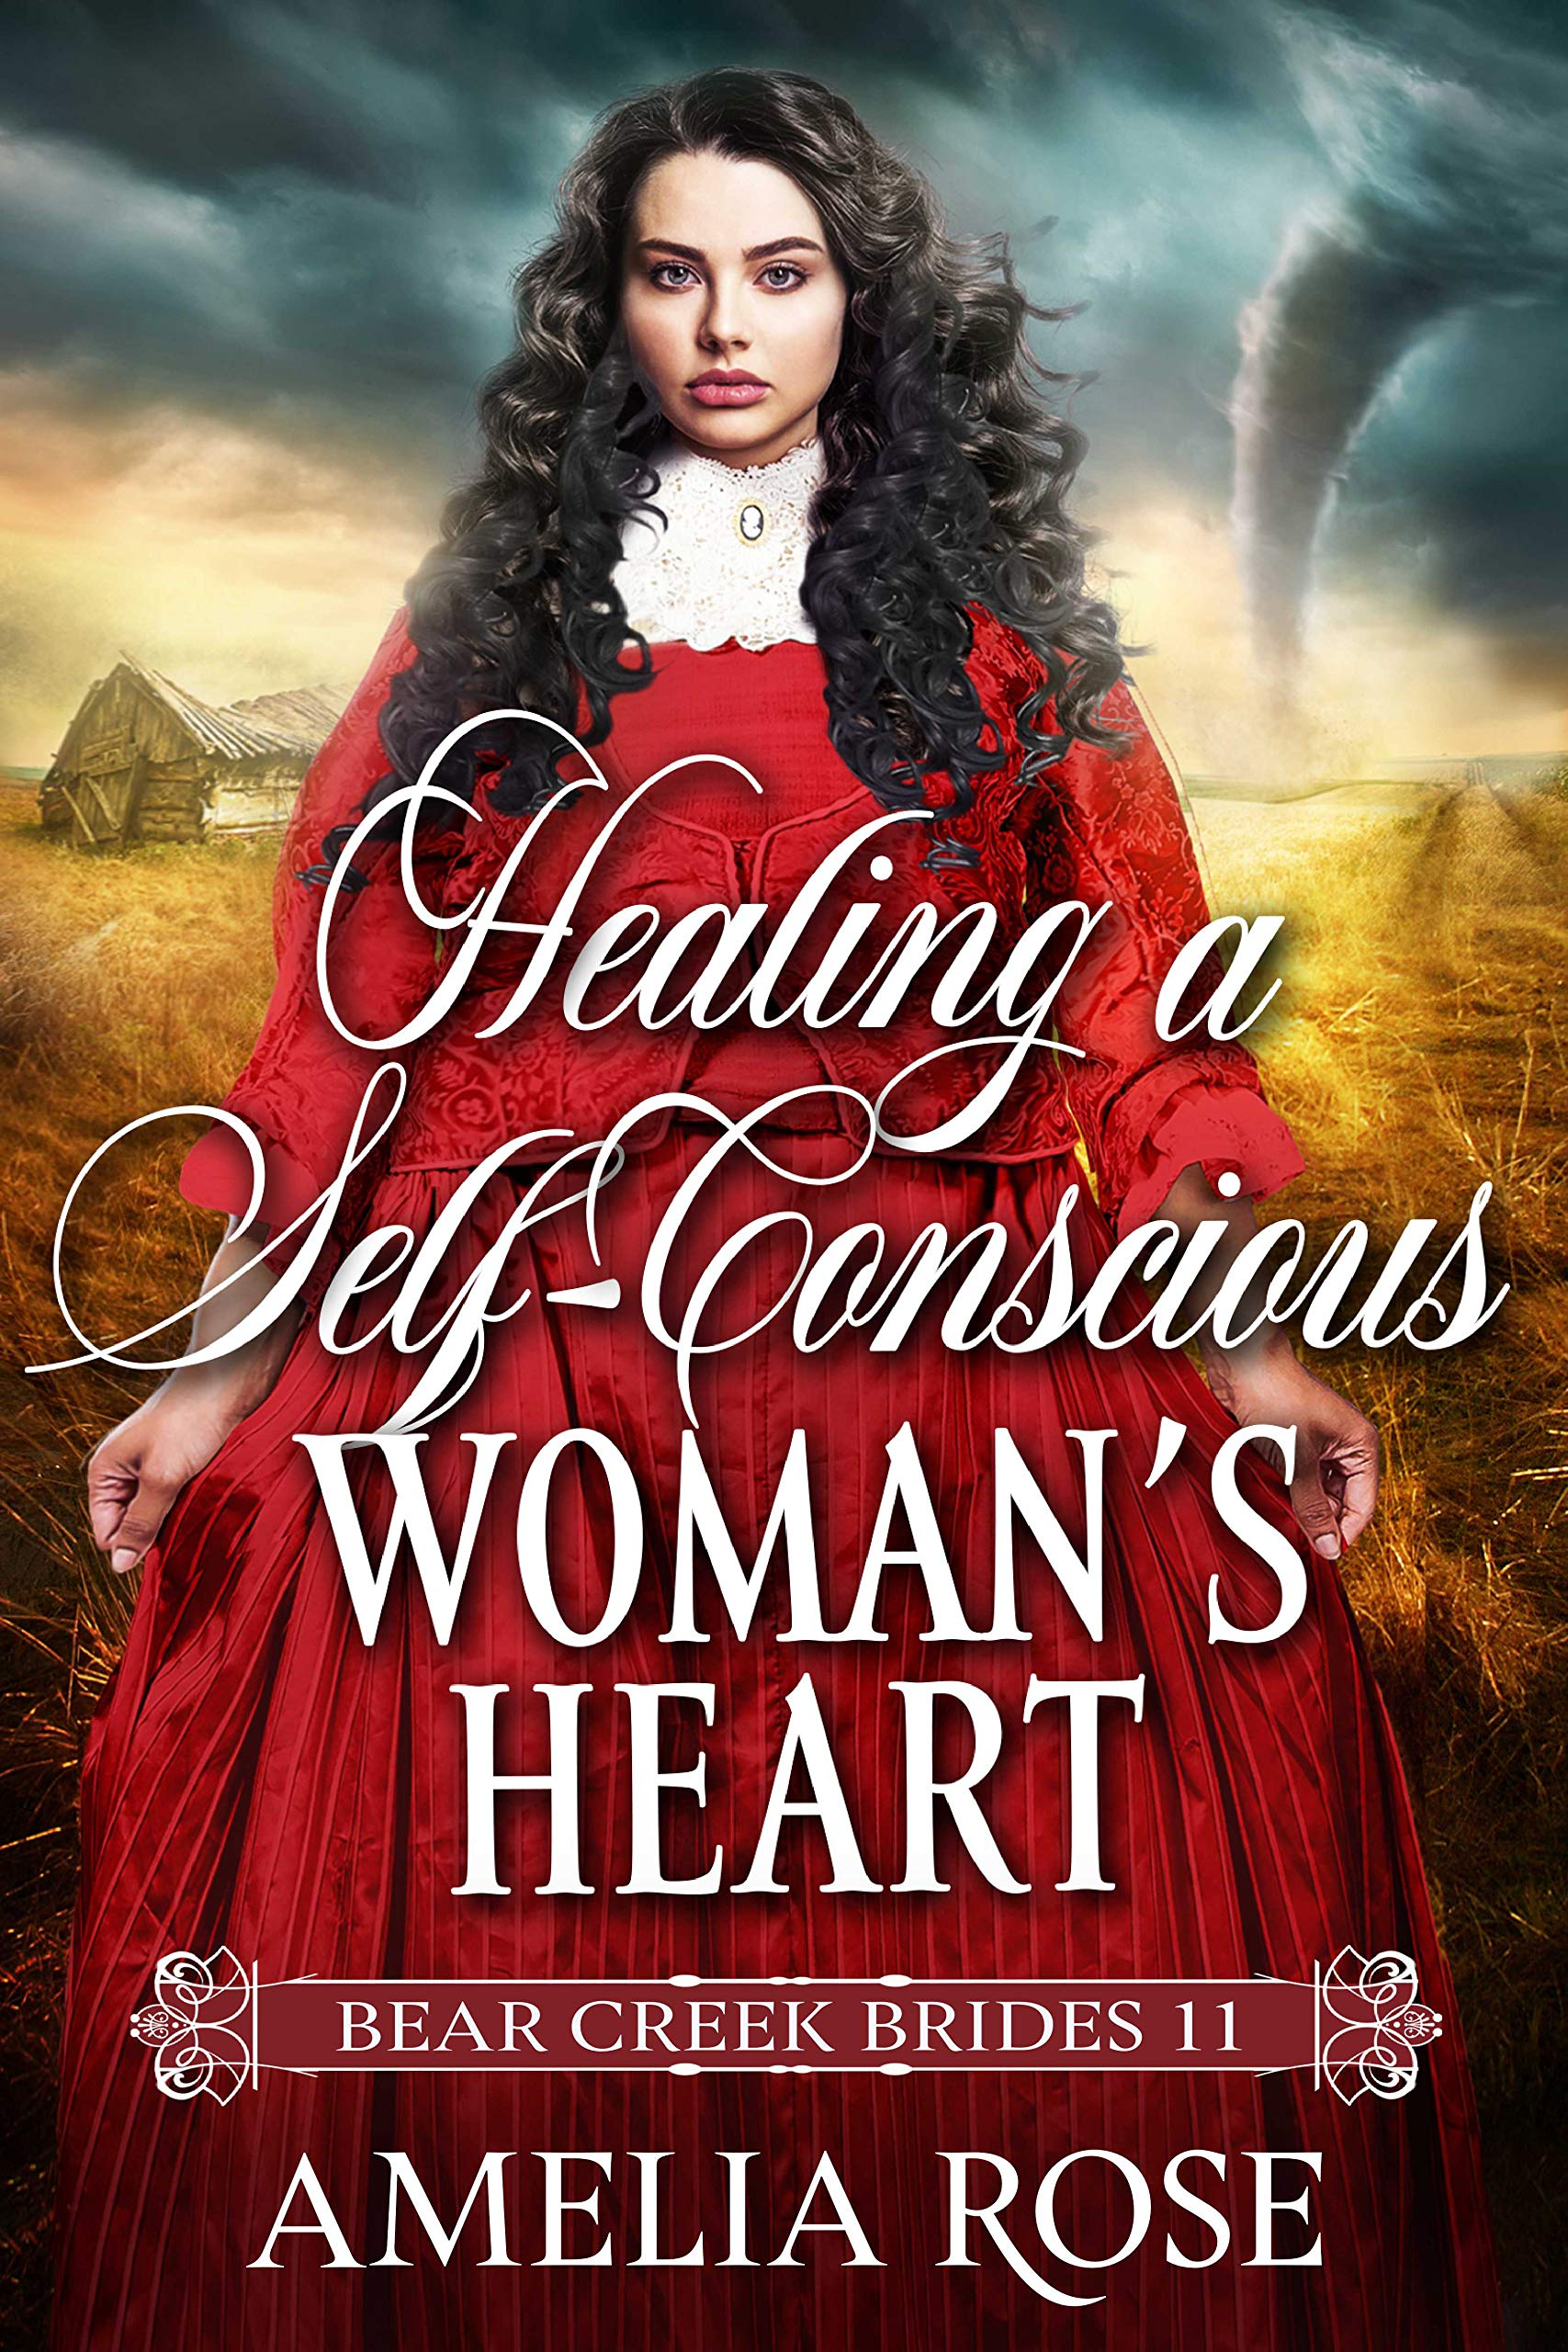 Healing a Self-Conscious Woman's Heart (Bear Creek Brides #11)